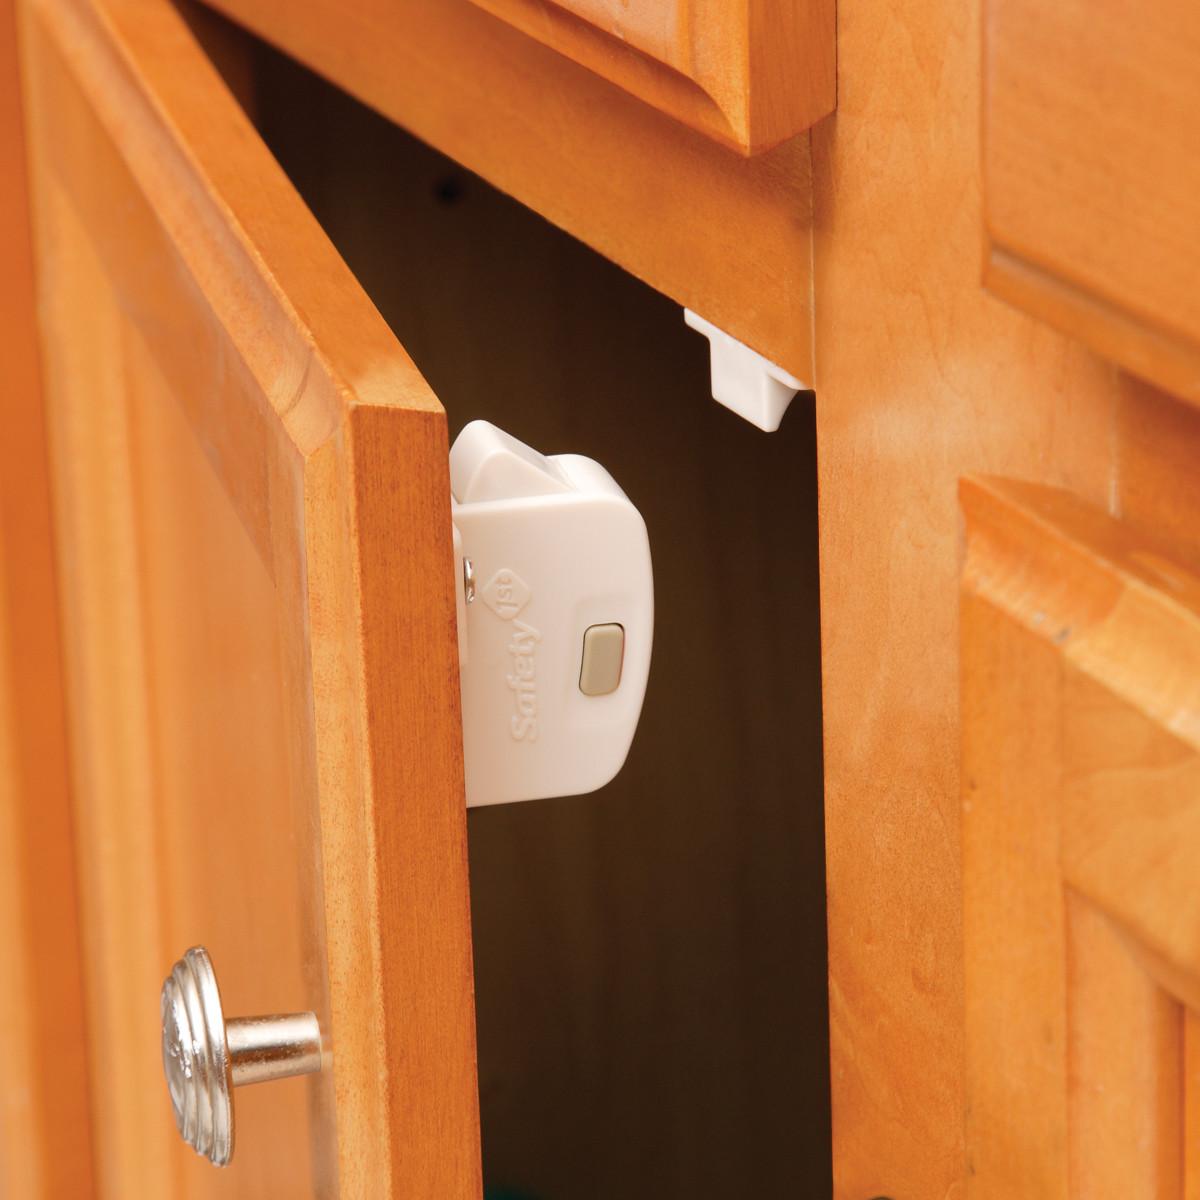 Safety 1st Complete Magnetic Locking System (8 Locks, 1 Key)